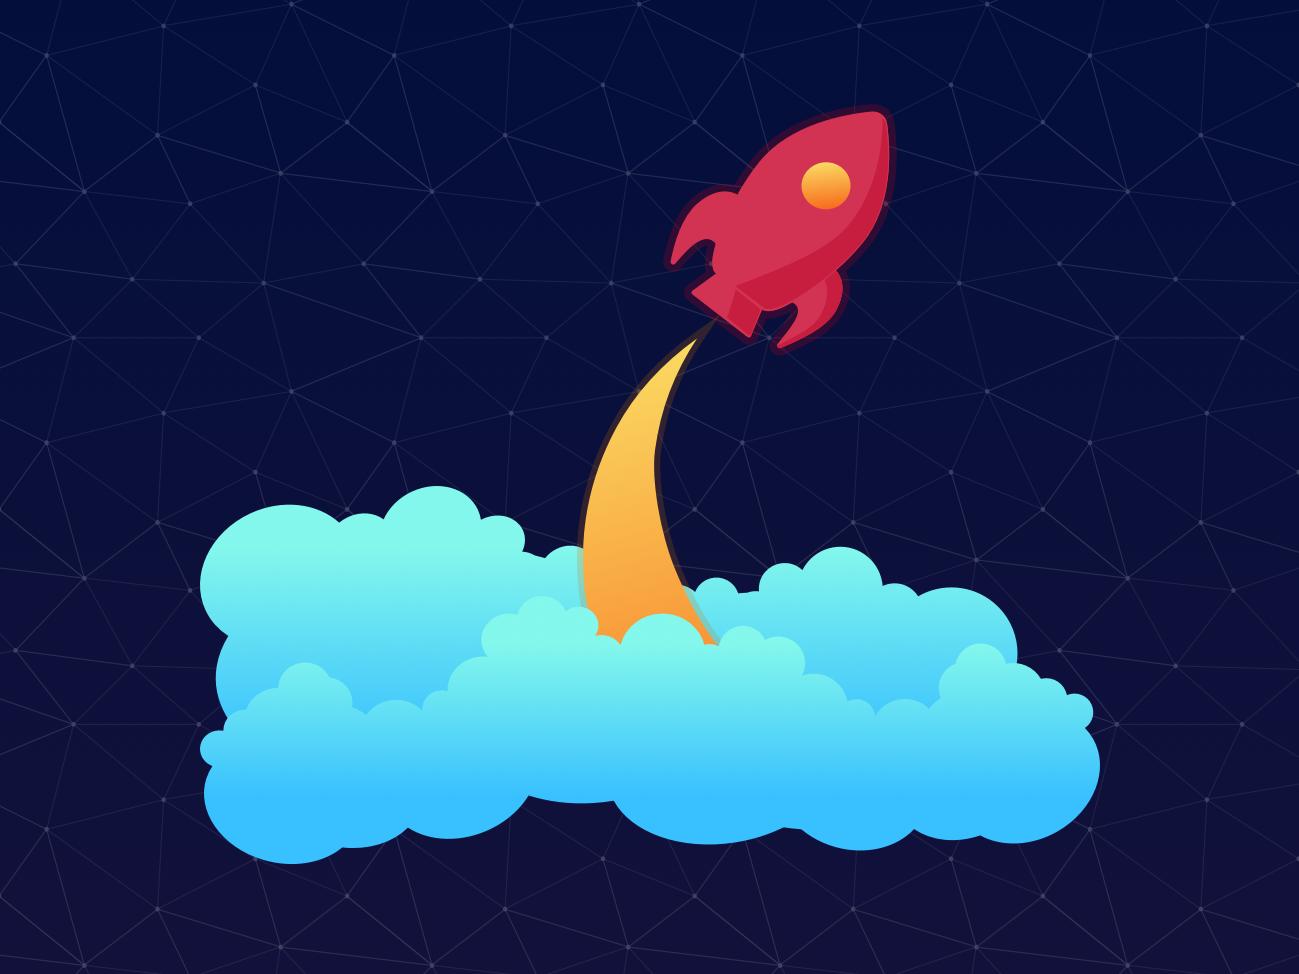 Rocket rocket launch blast off rocket clouds galaxy vector sky stars space adobe illustrator illustration